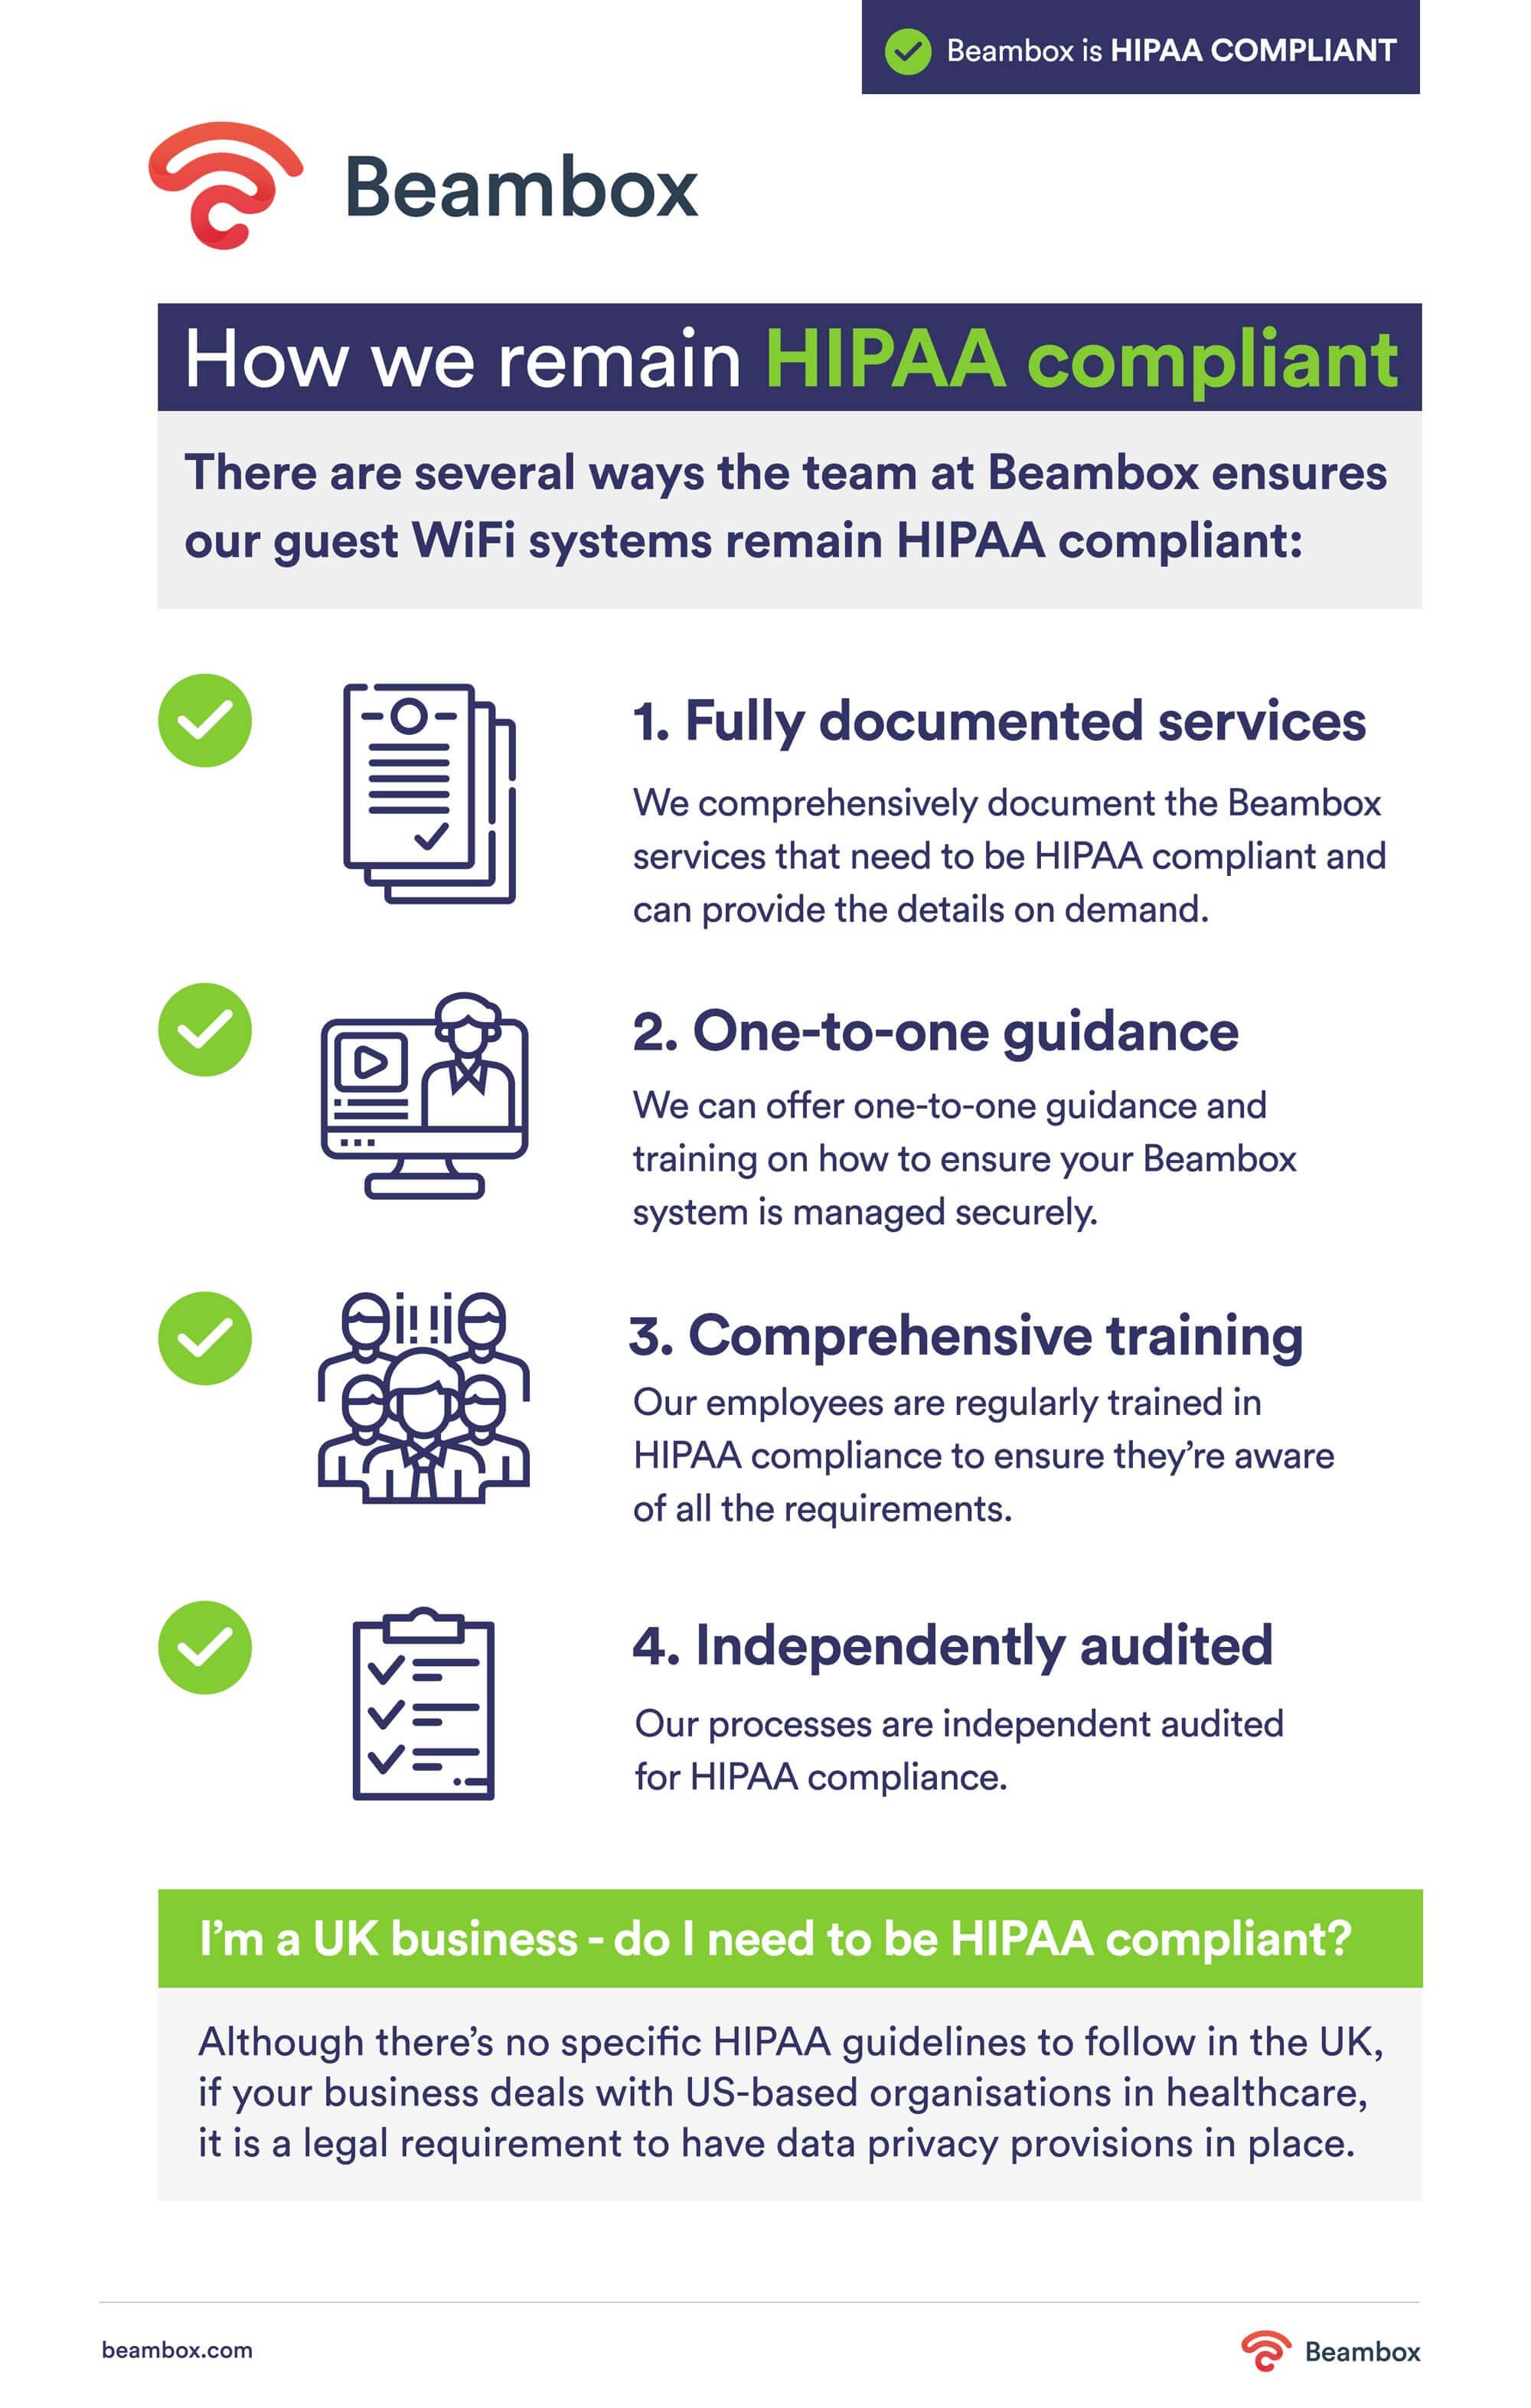 Beambox HIPAA compliant infographic